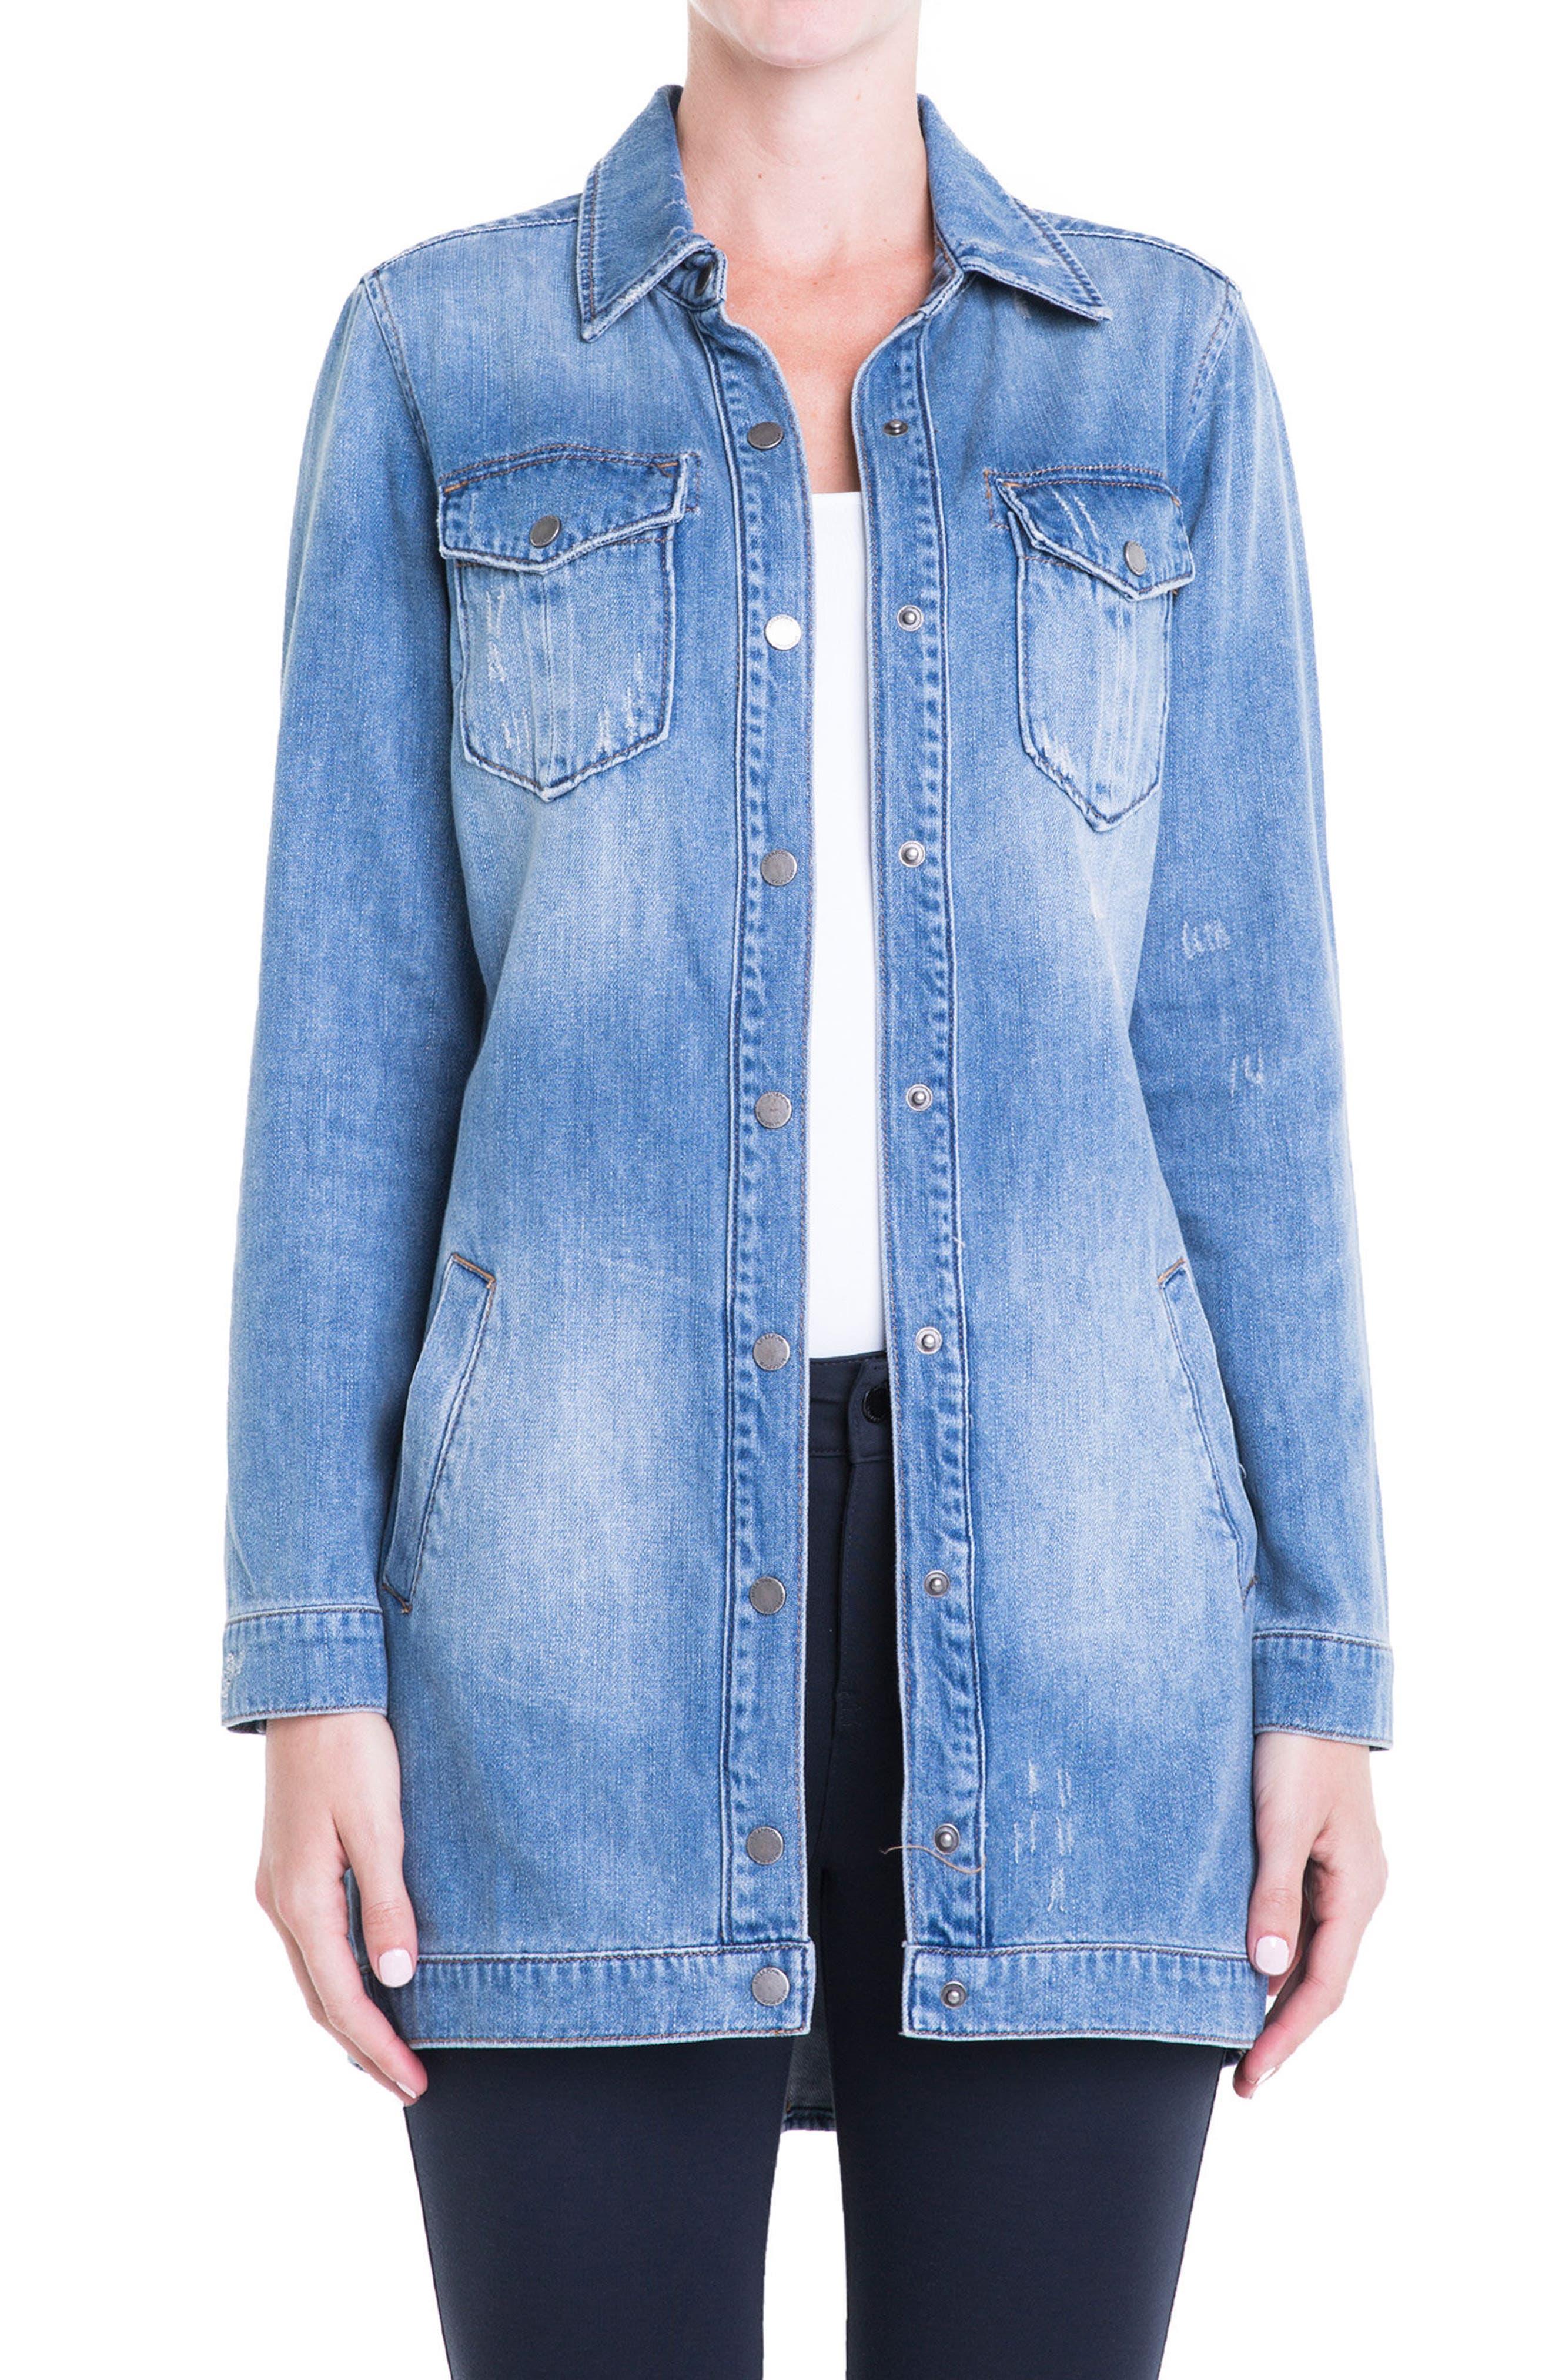 Coats, Jackets & Vests Old Navy Denim Blue Jean Jacket Size Medium Cropped